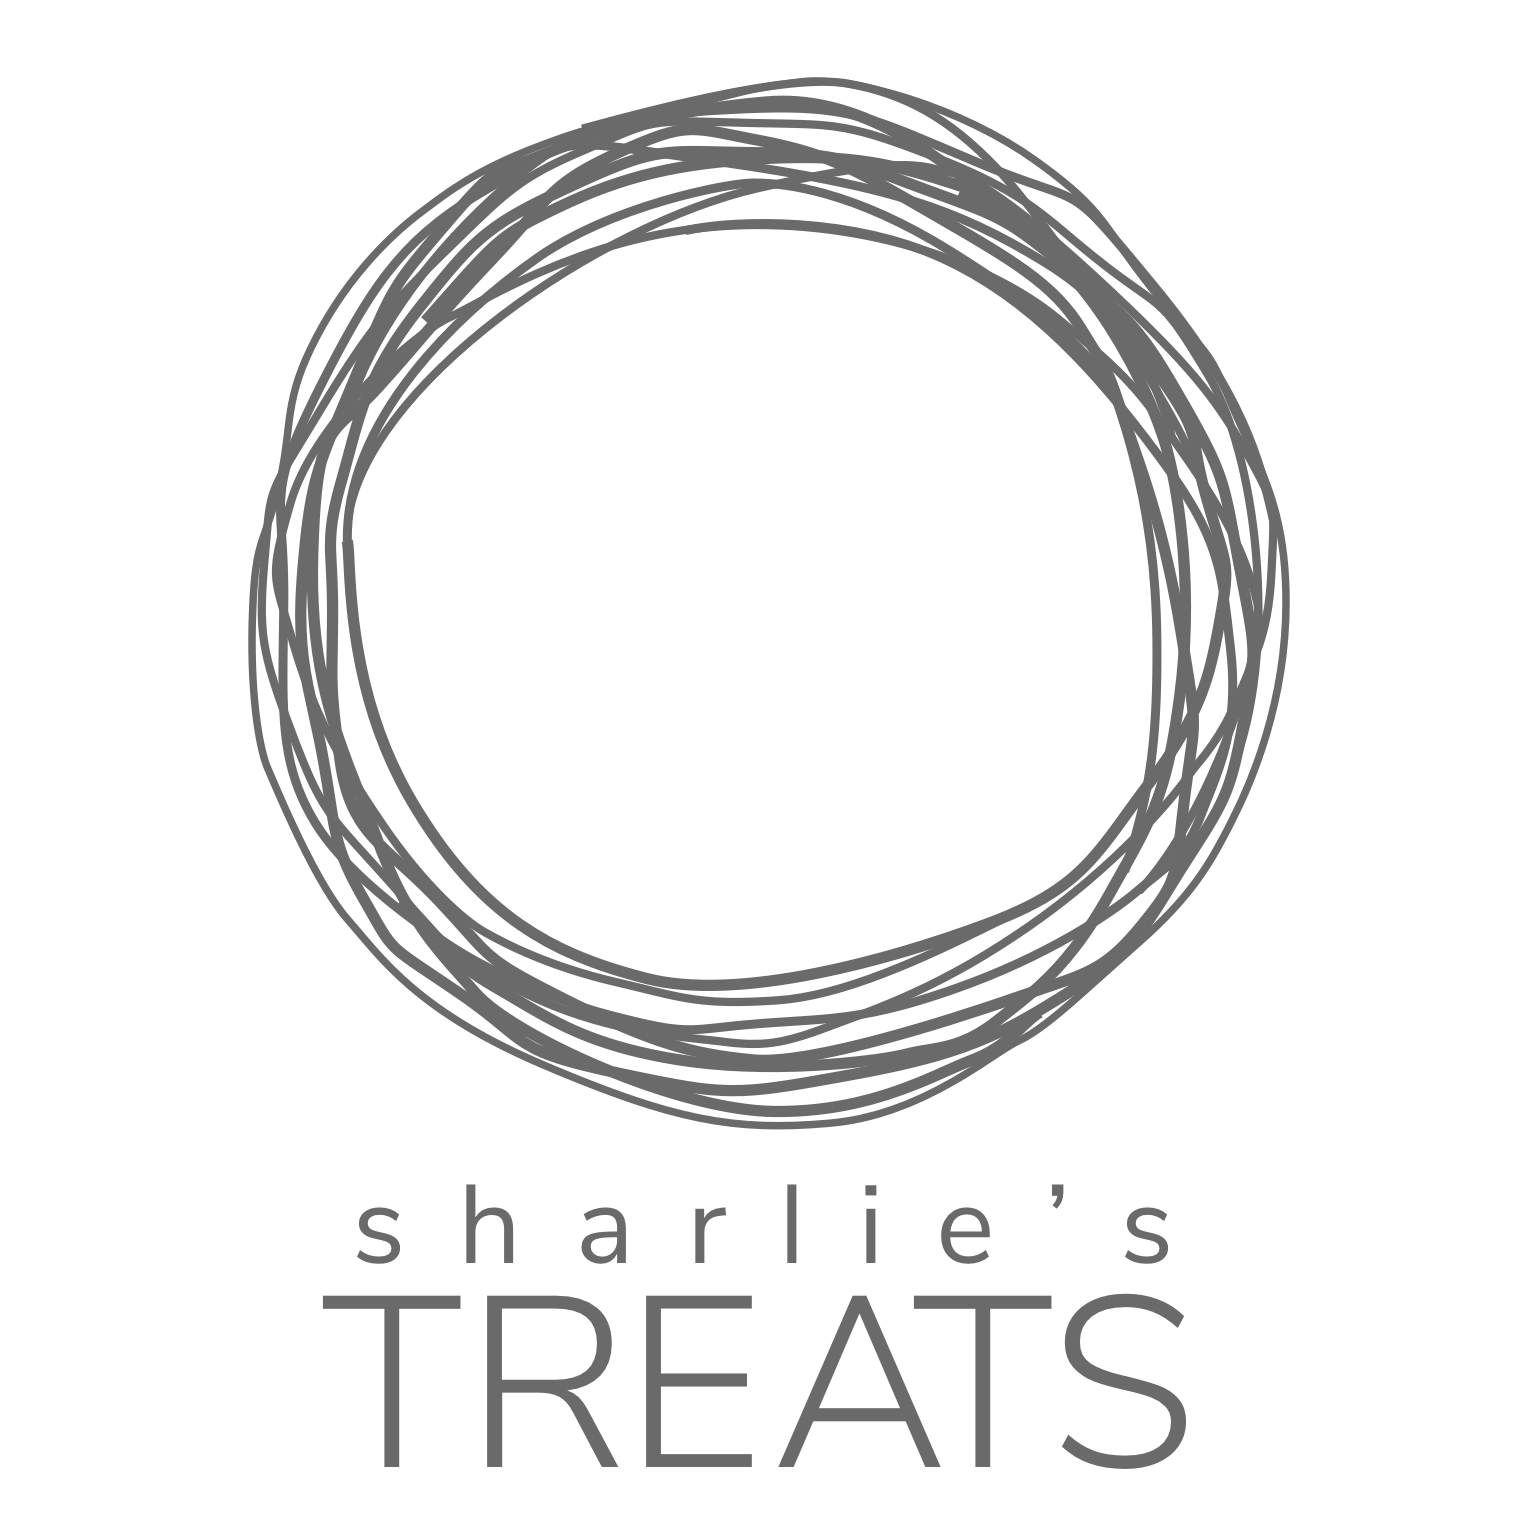 sharlie's treats logo.png